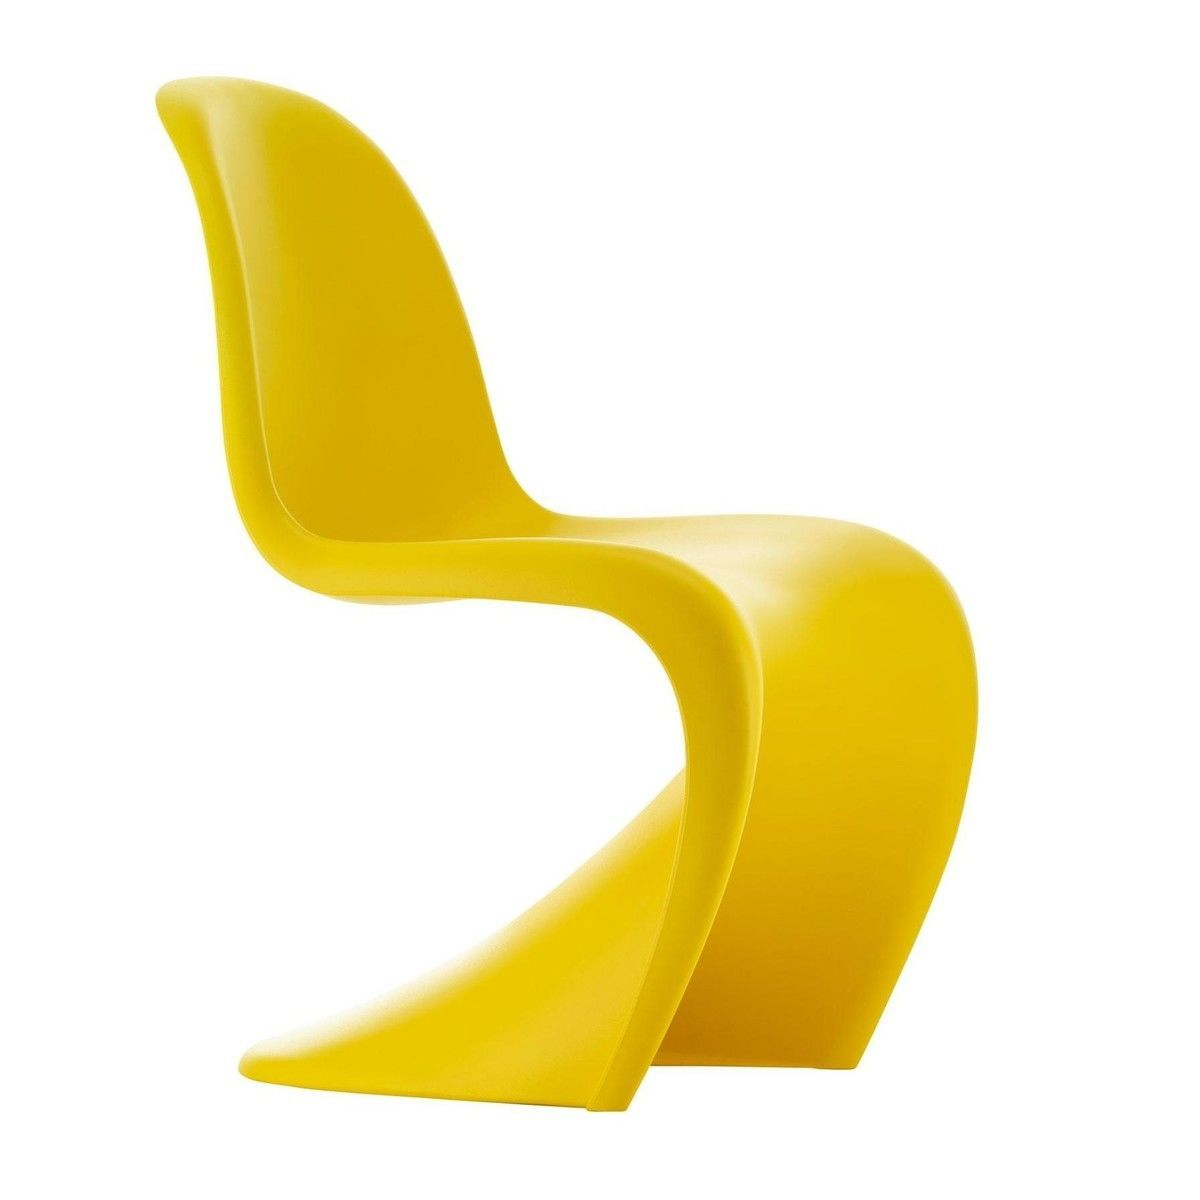 panton chair  limited edition   vitra  ambientedirectcom - vitra  panton chair  limited edition   sunlight yellowspecialcolour